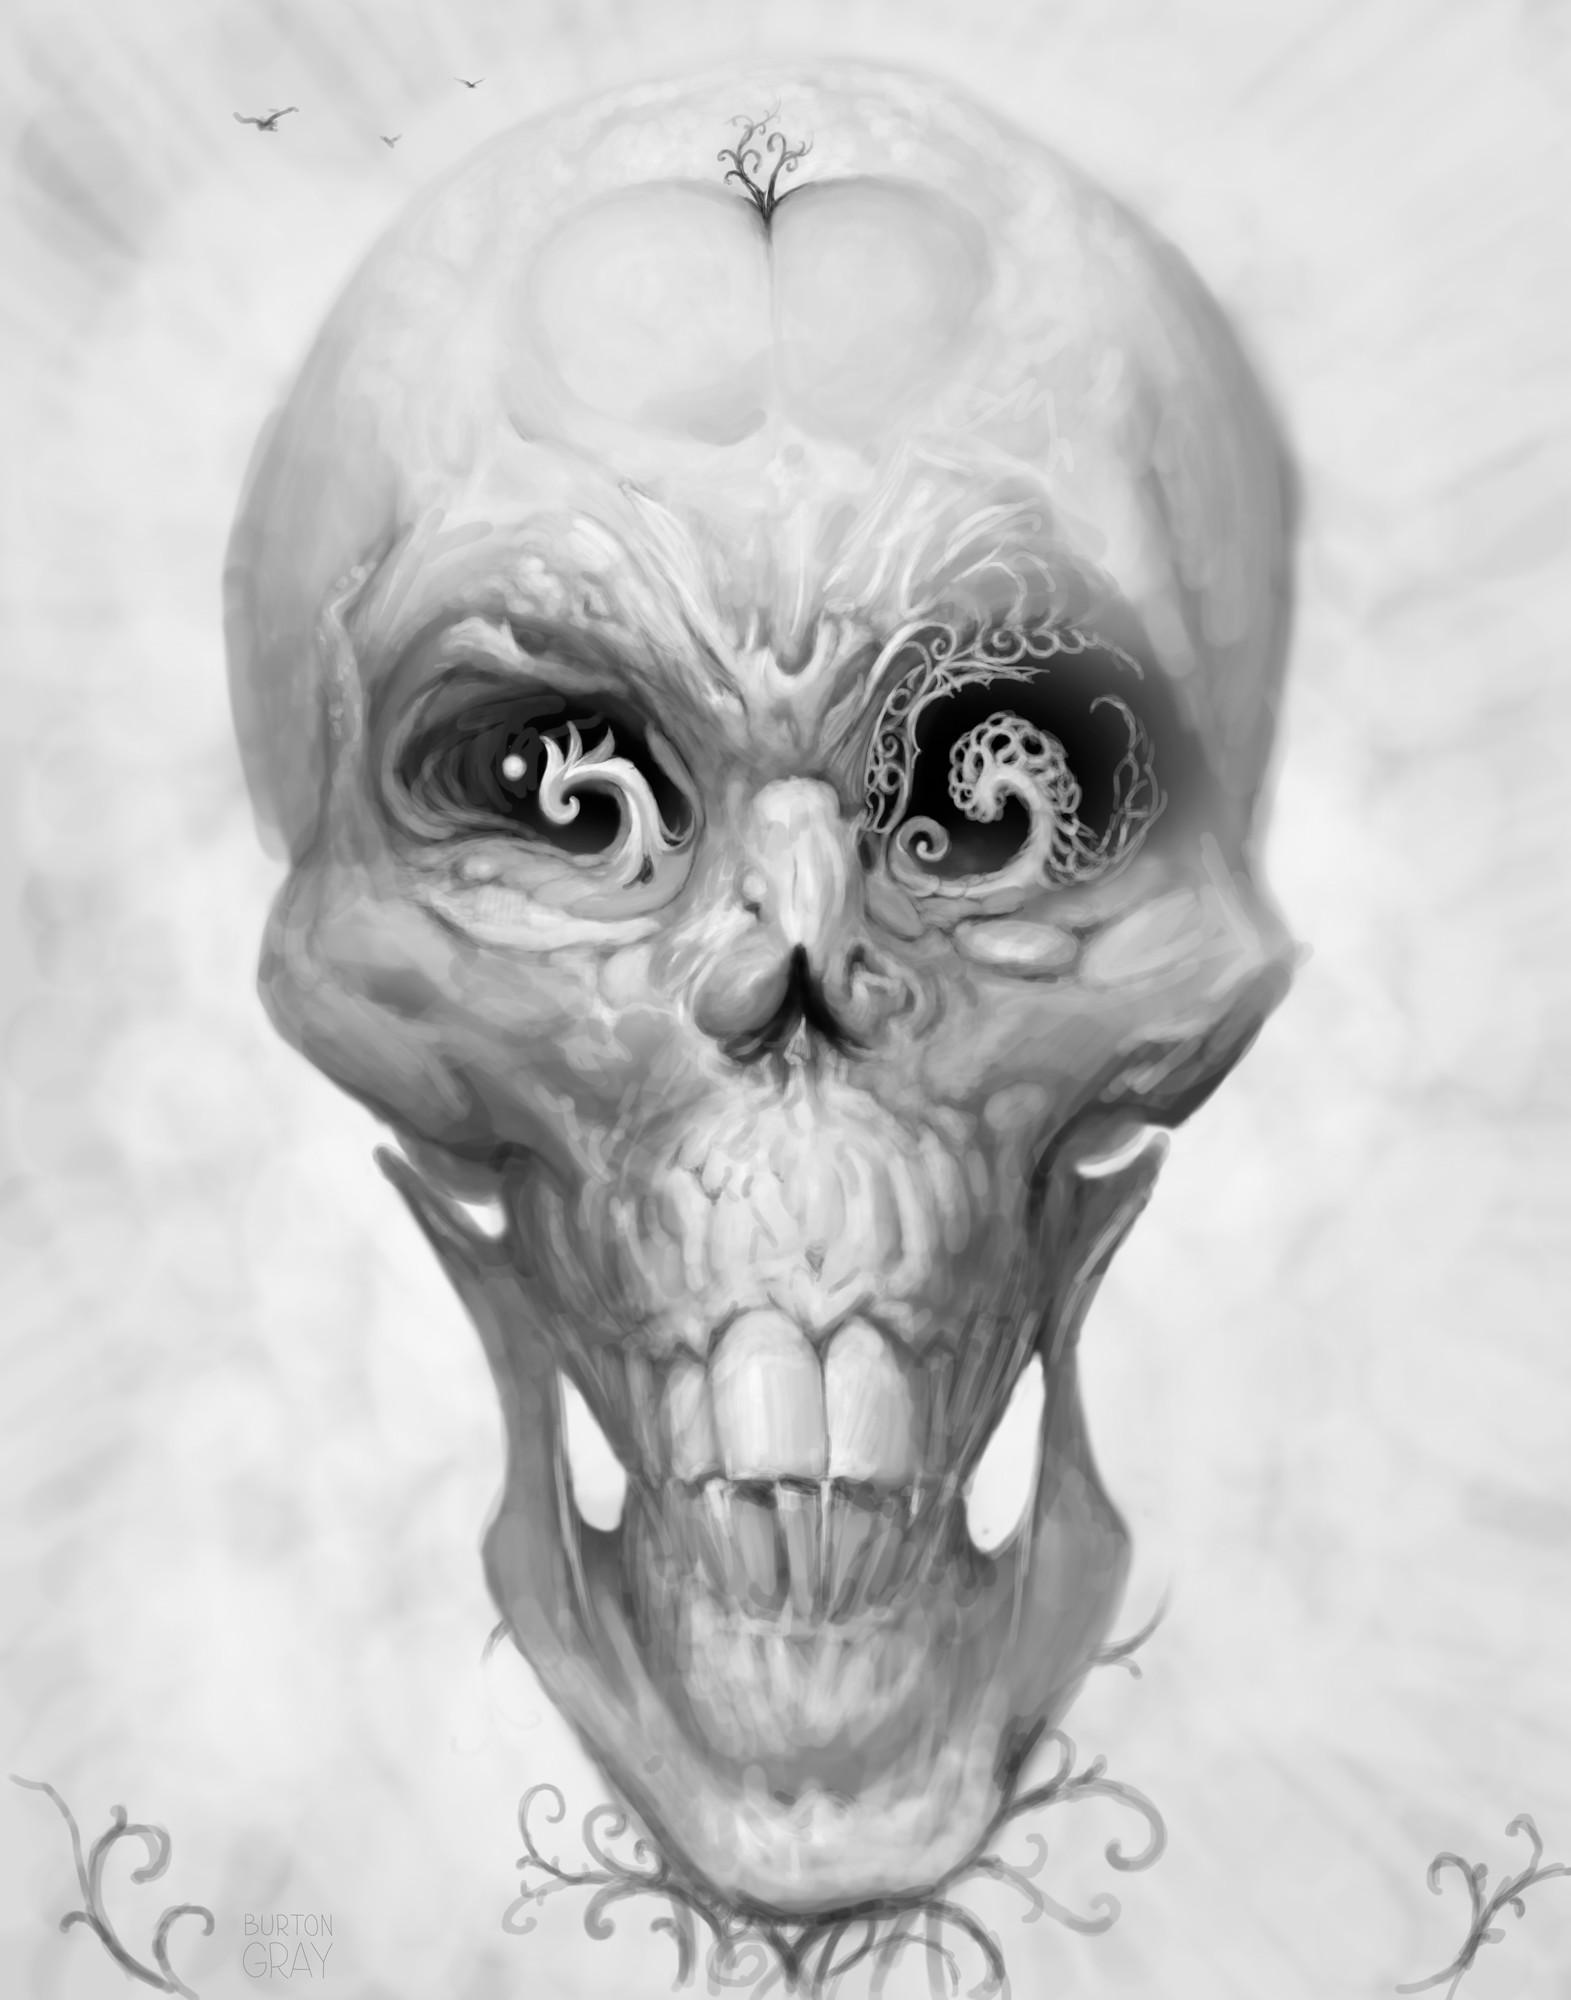 ca6c00e40 Burton Gray's Black White painting of a surreal skull